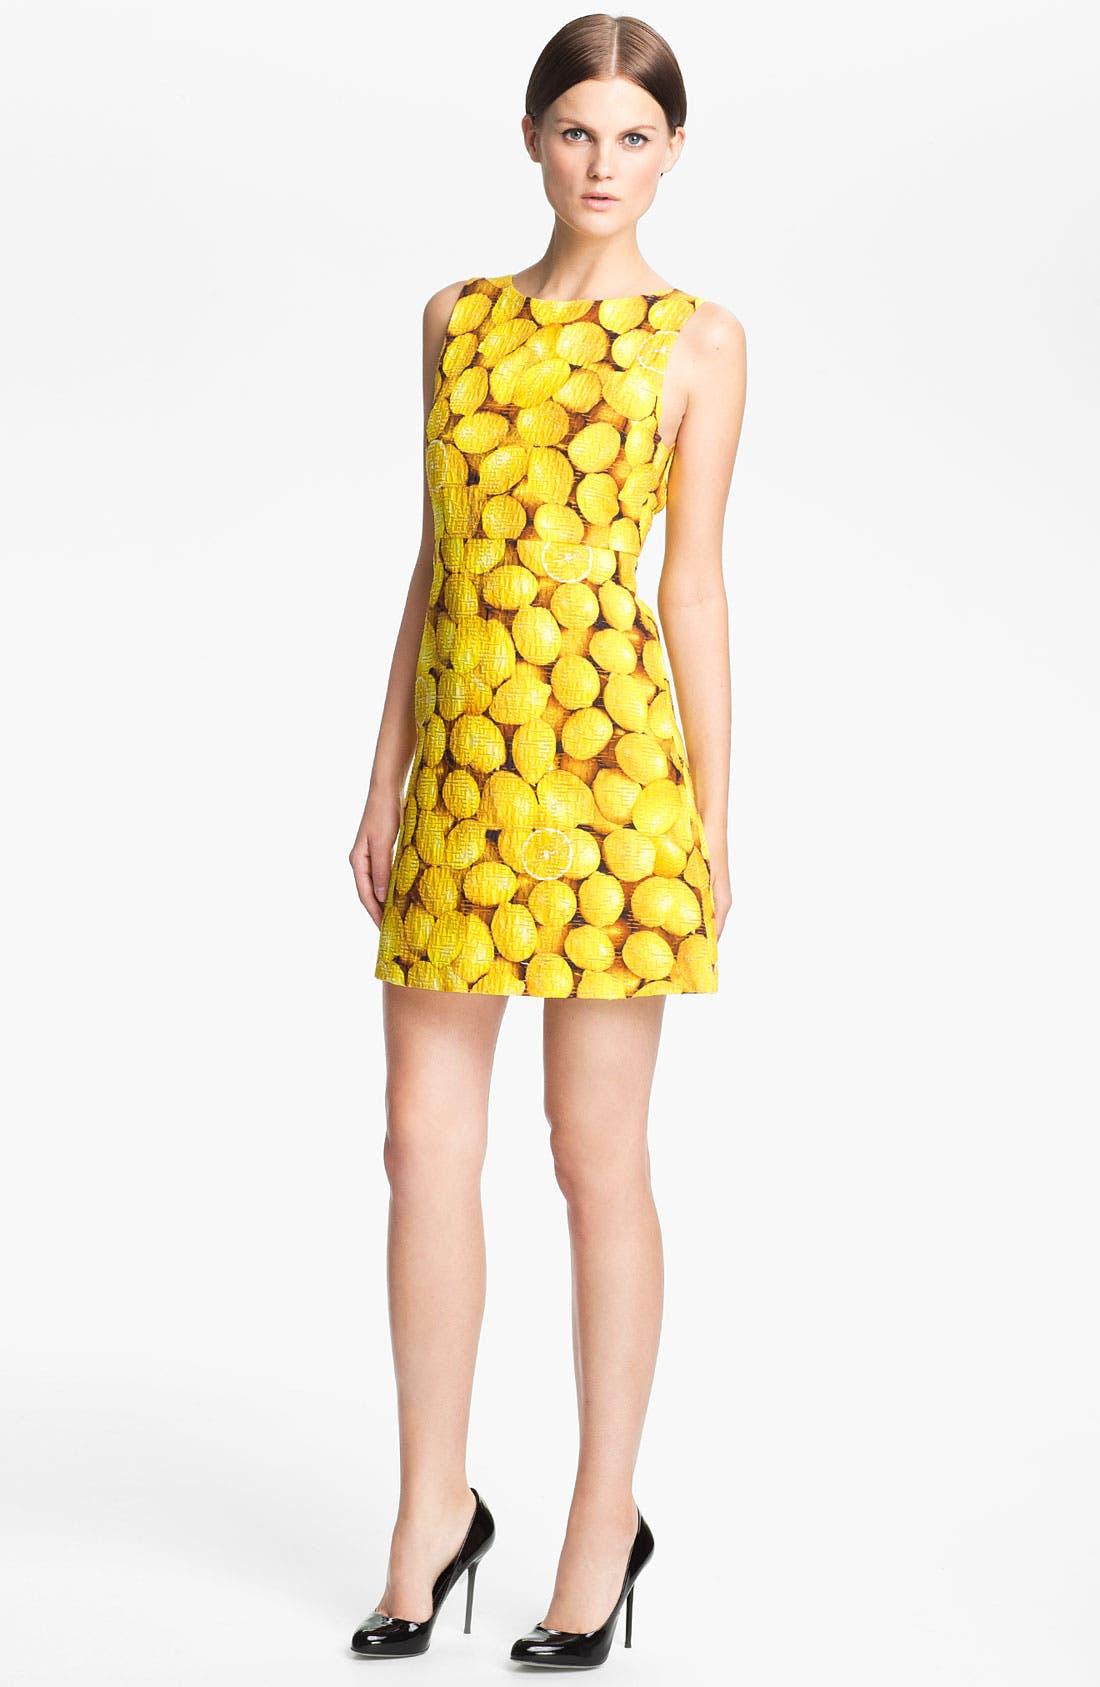 Alternate Image 1 Selected - Alice + Olivia 'Candice' Print A-Line Dress